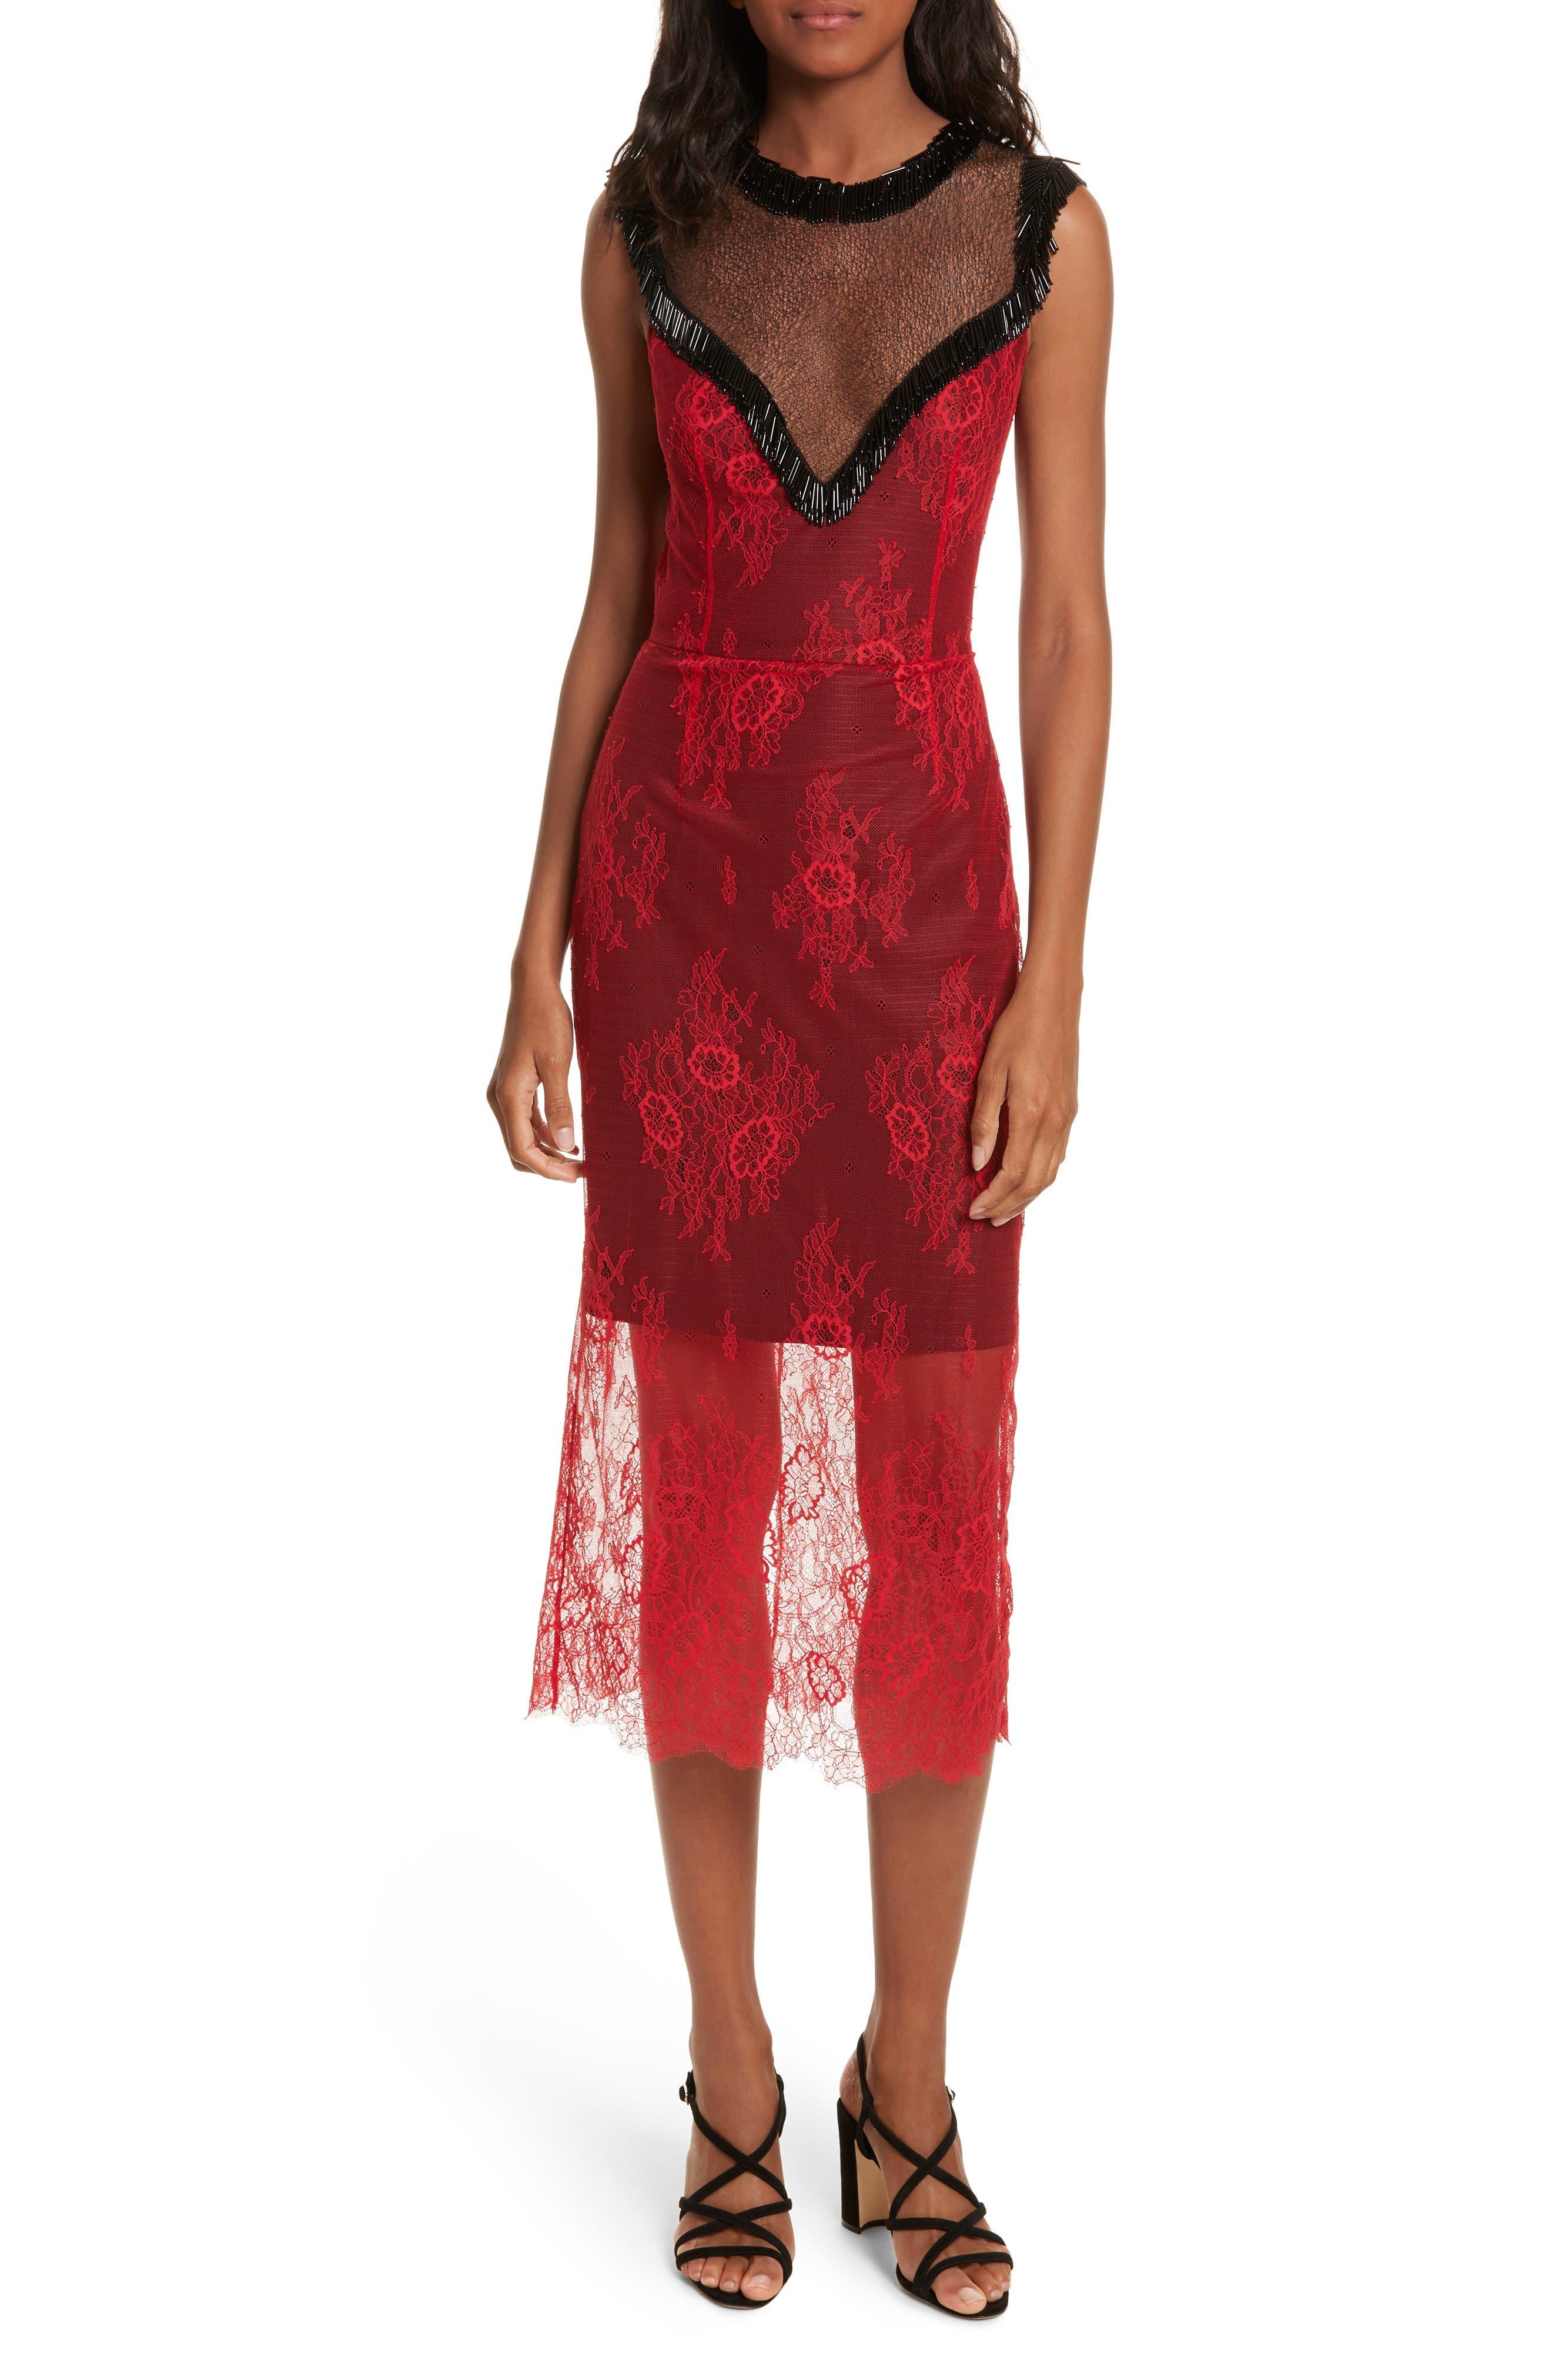 Main Image - Diane von Furstenberg Beaded Lace Overlay Dress